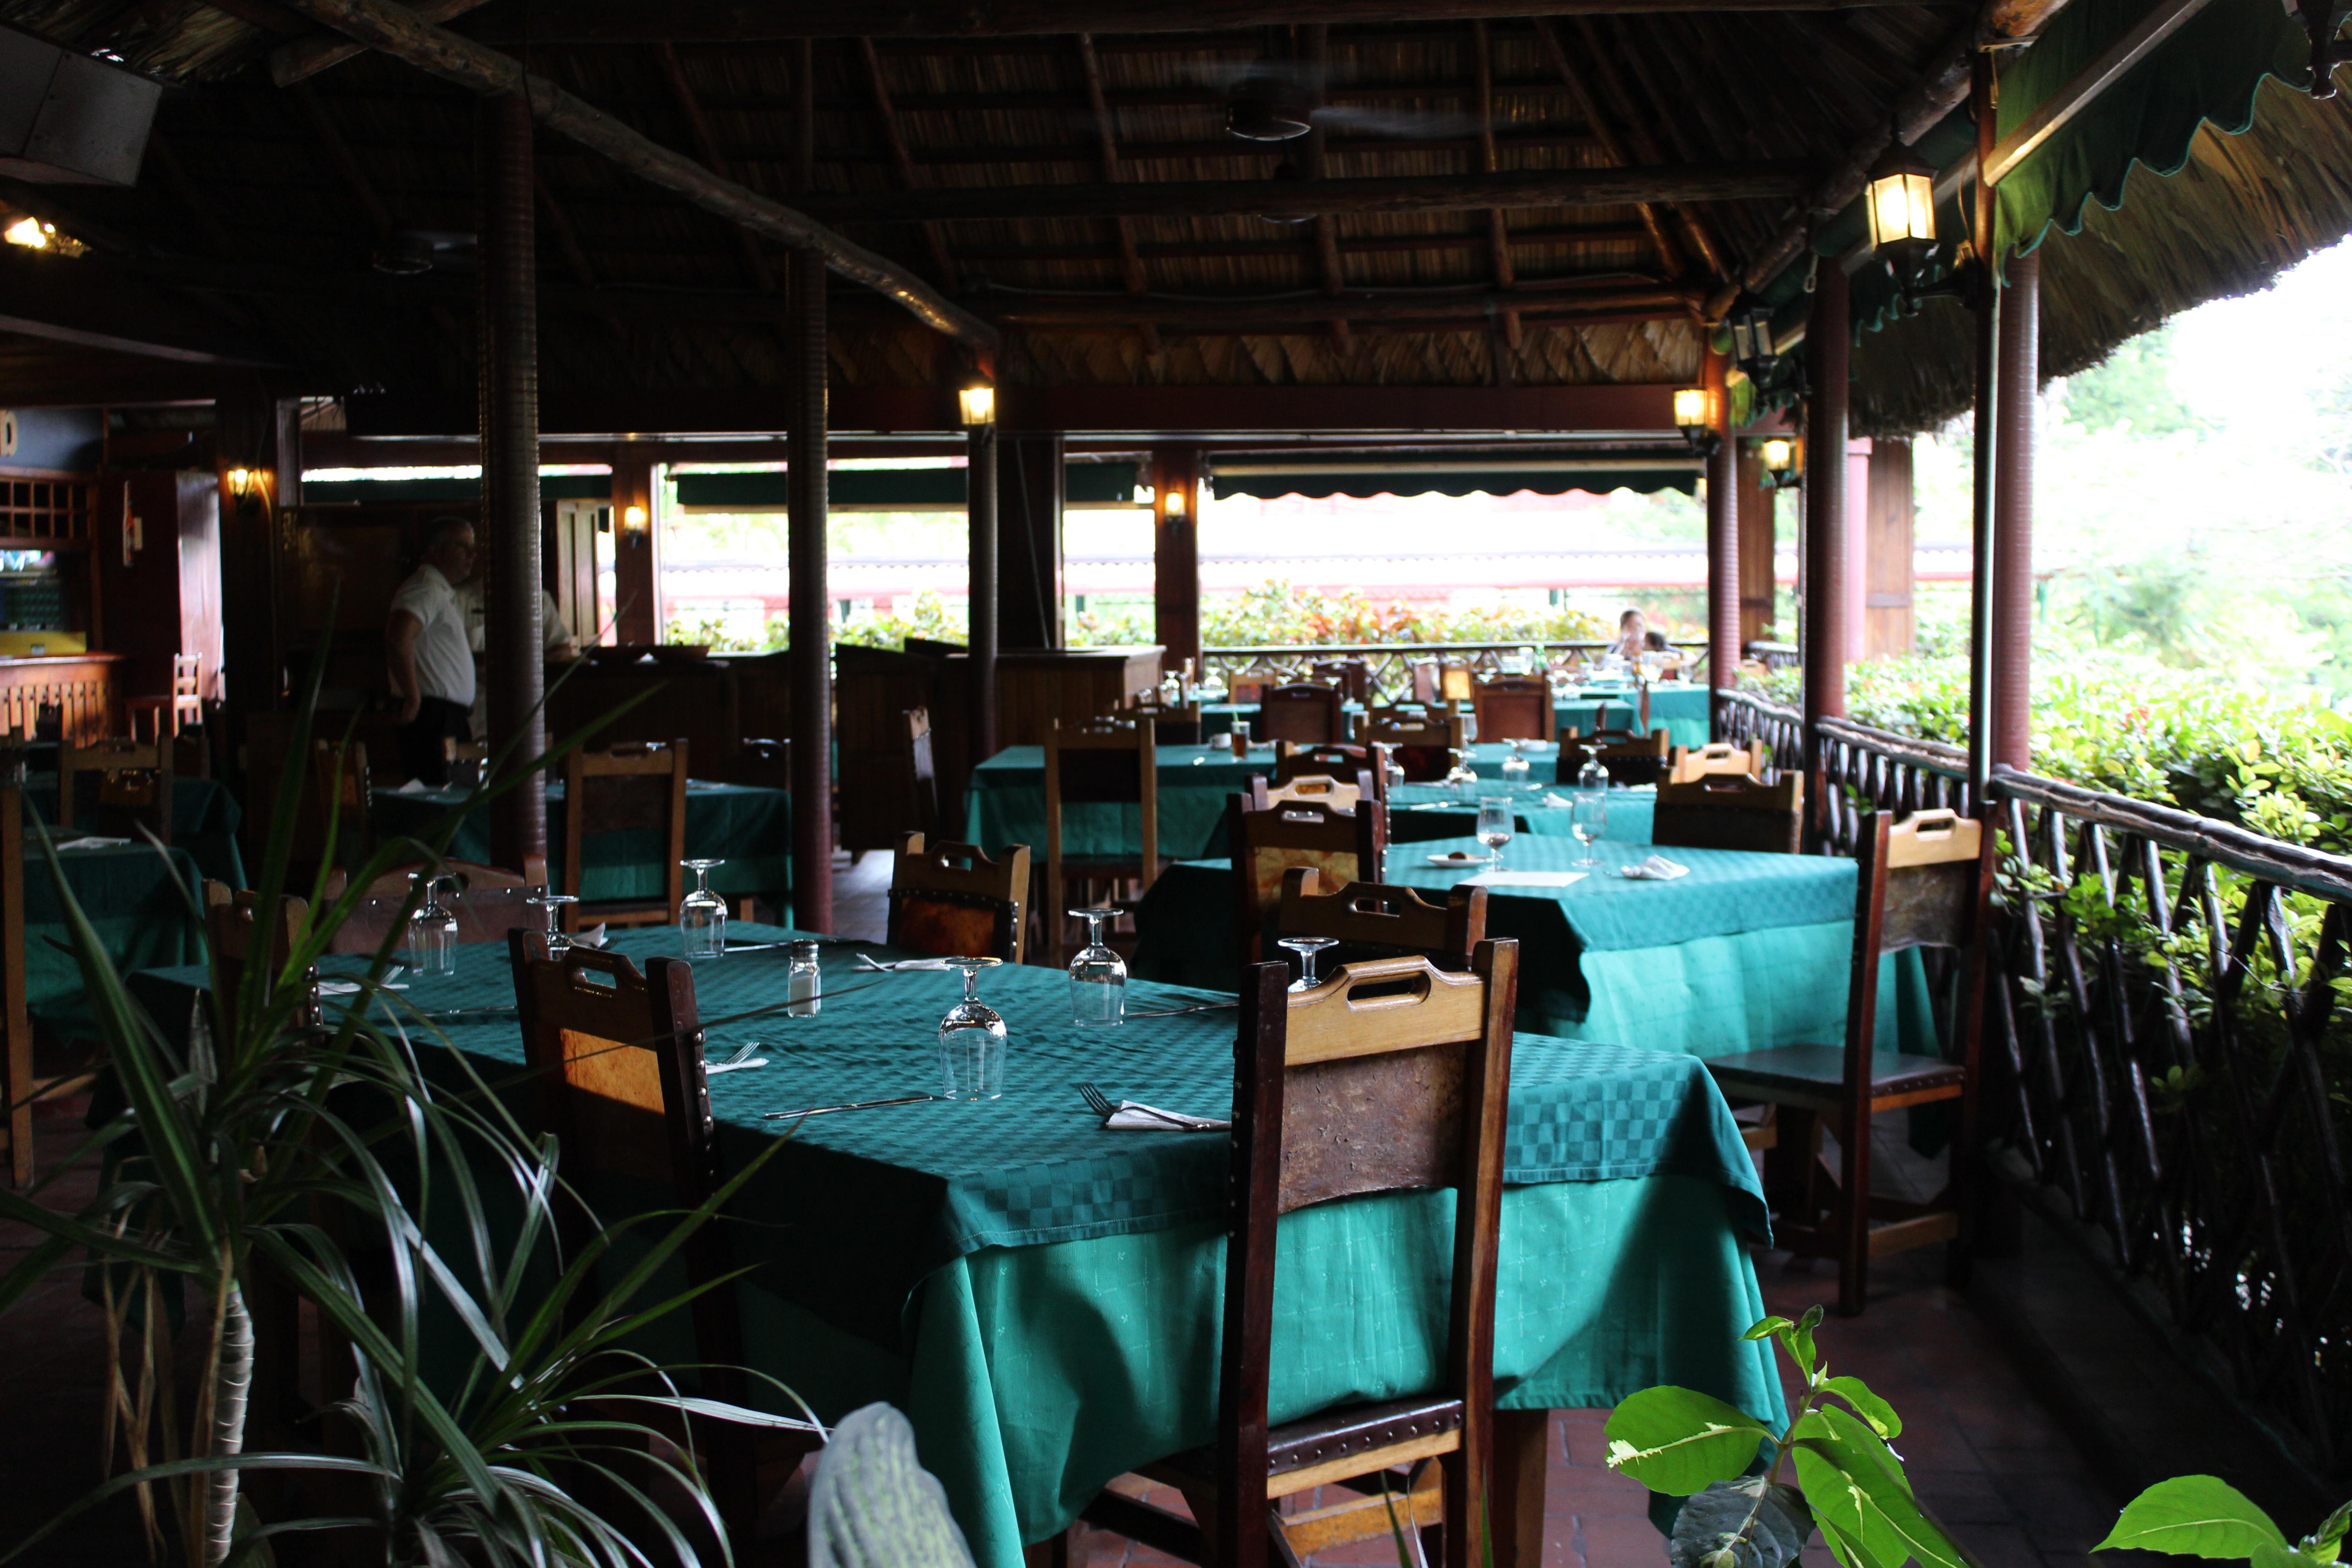 El Aljibe is an open air state-run Cuban restaurant.